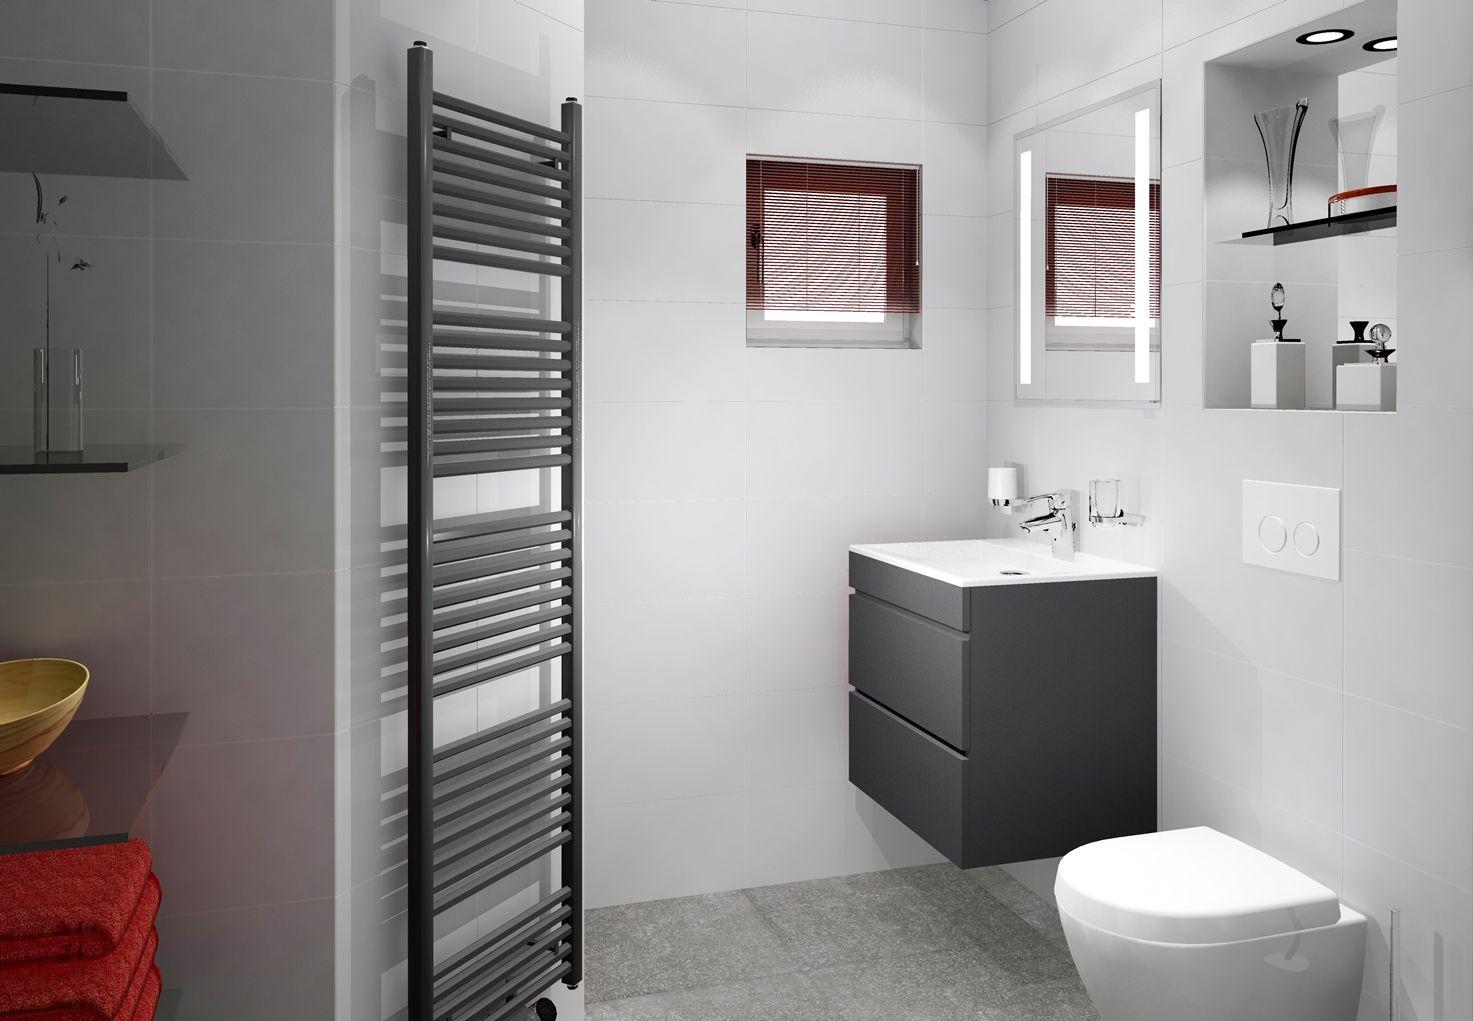 kleine badkamer van 153x238cm met ingebouwde spiegelkast en